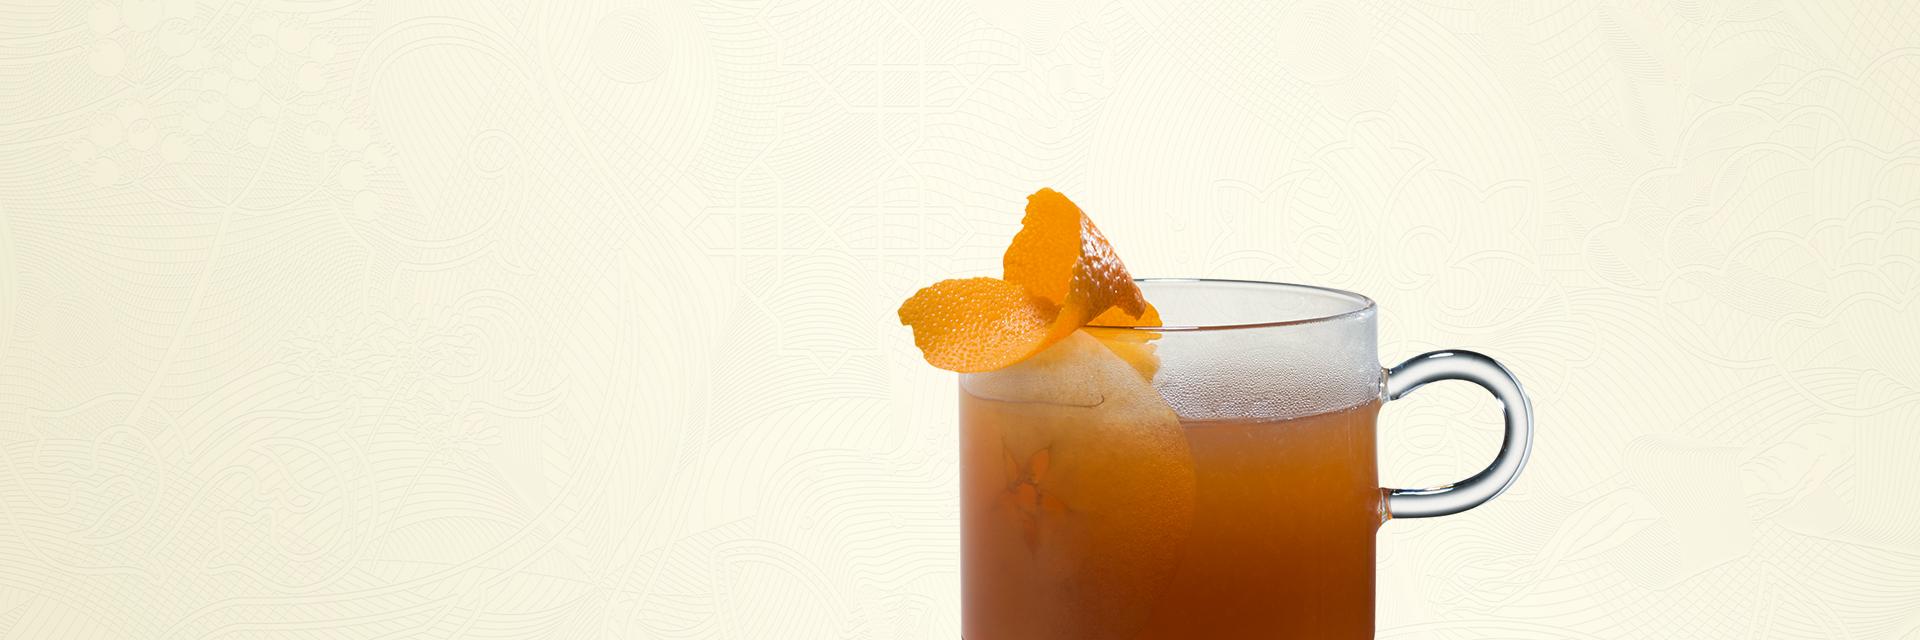 Cóctel caliente - Spiced Apple Tea